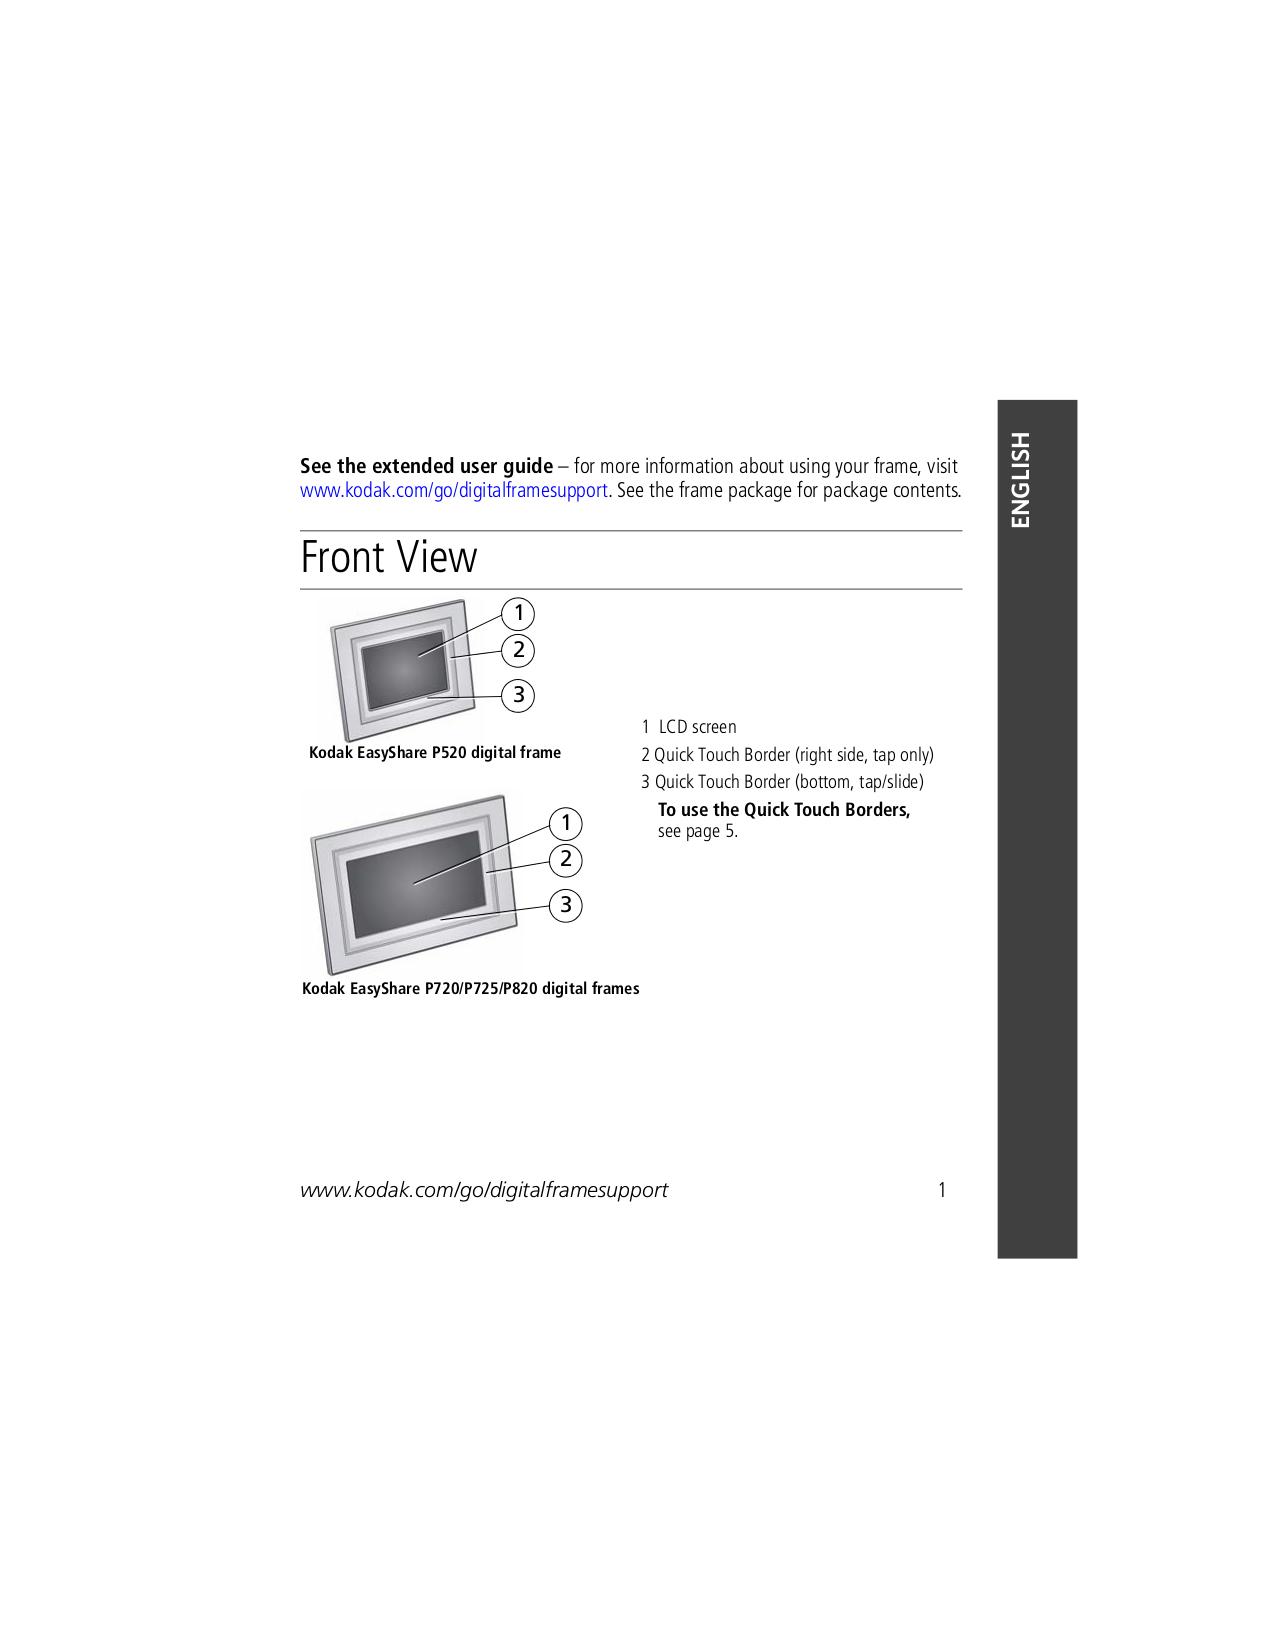 pdf for Kodak Digital Photo Frame EasyShare P520 manual